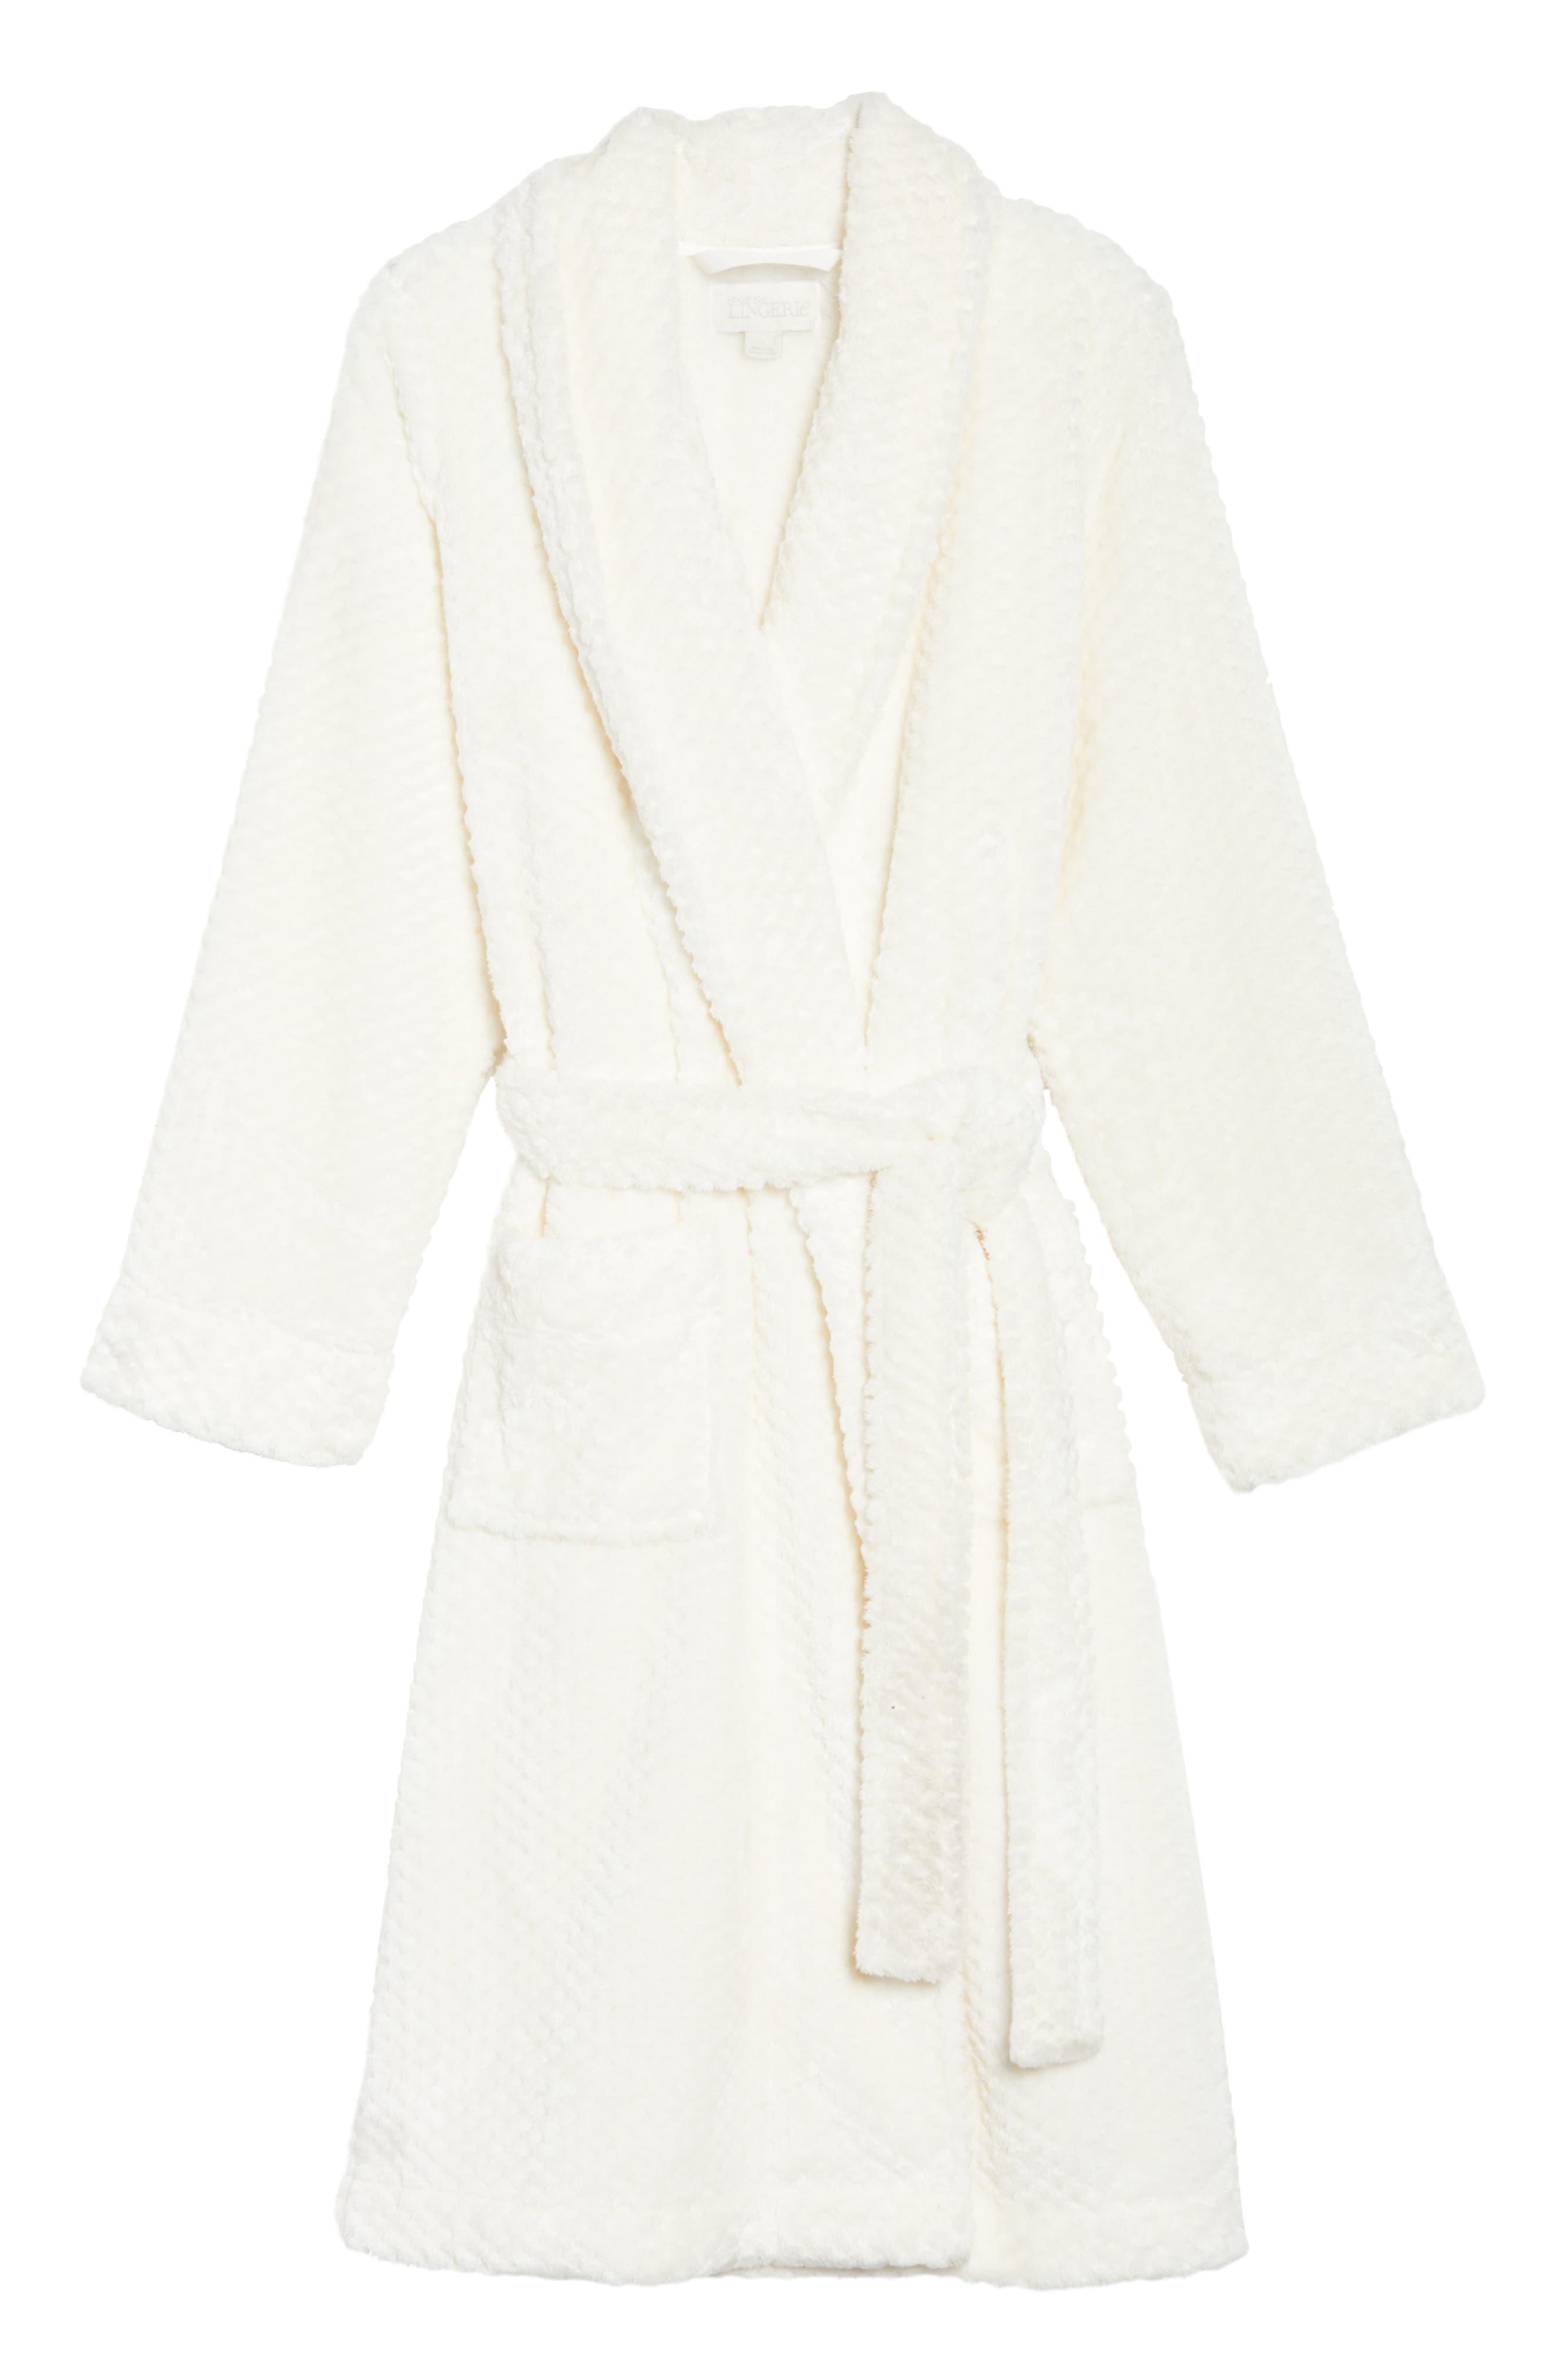 Nordstrom So Soft Plush Robe,                             Alternate thumbnail 18, color,